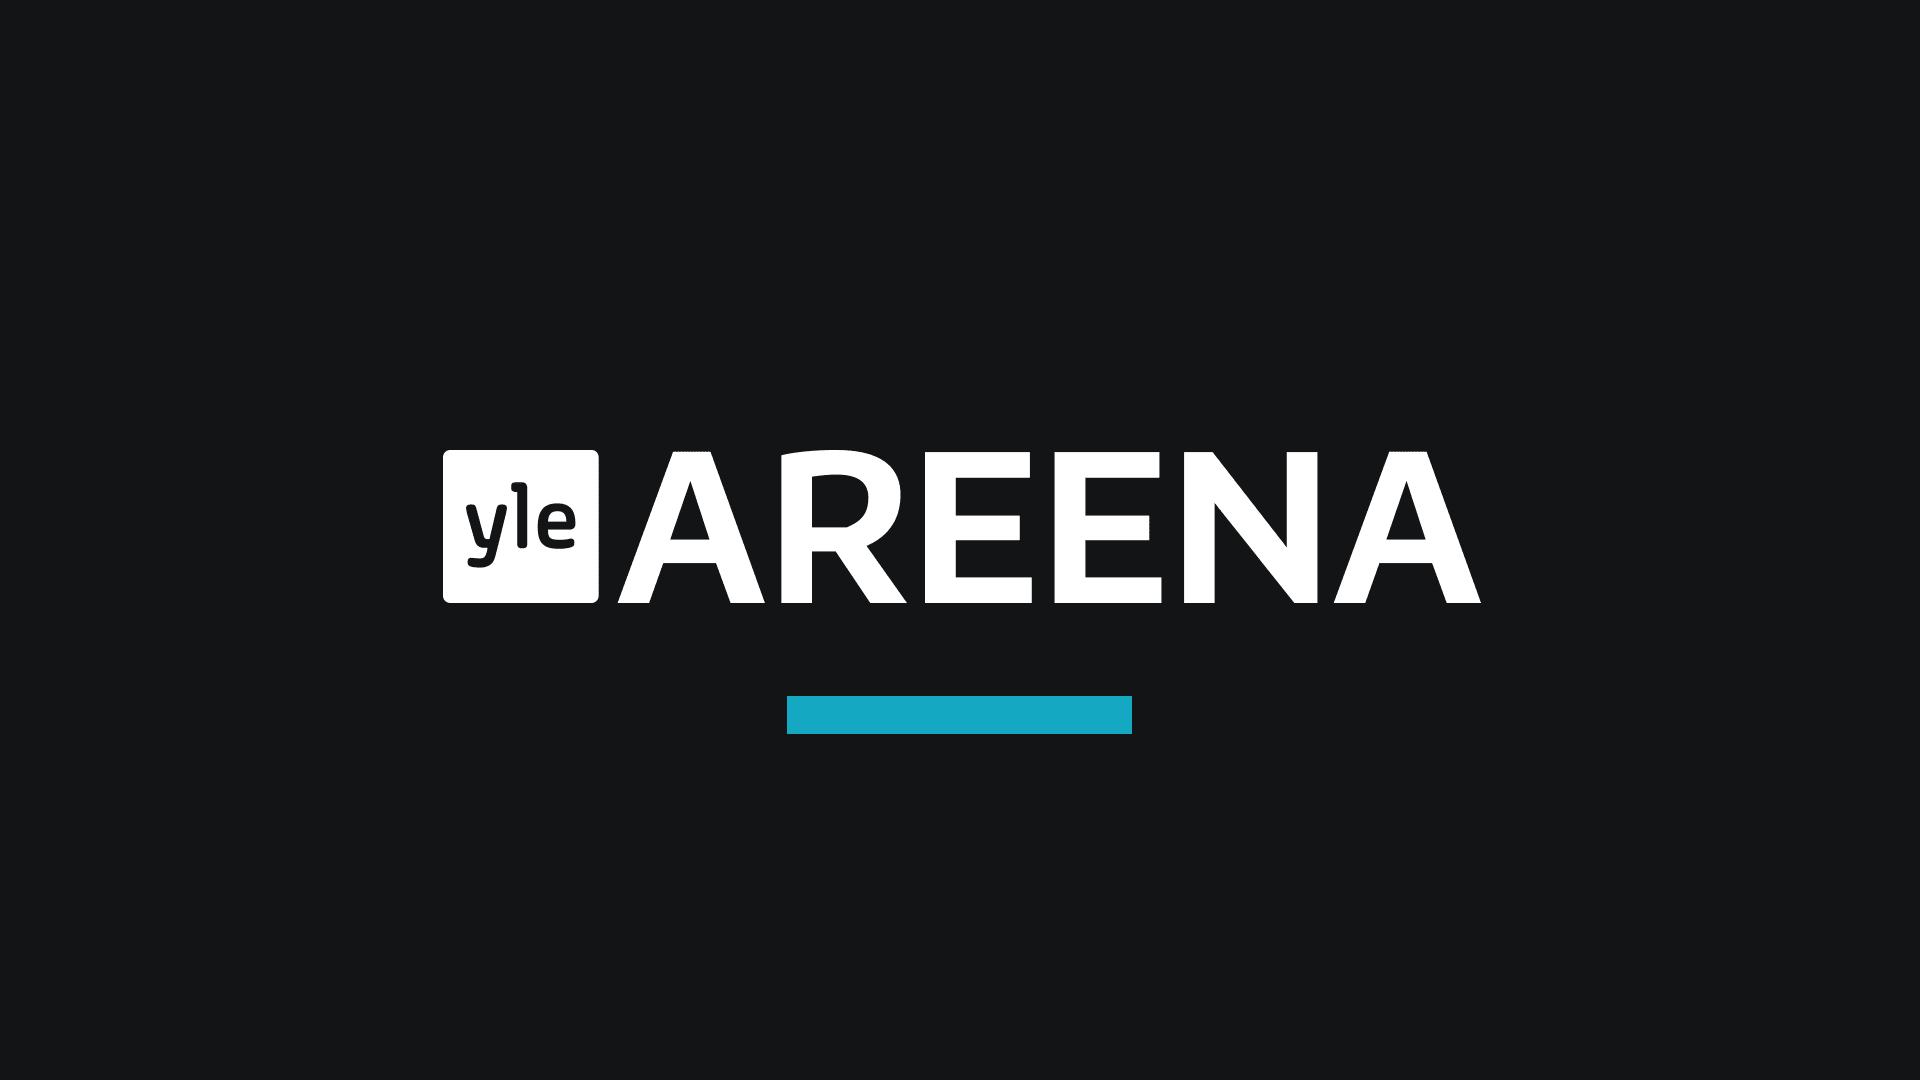 Yle Areena Tekstitys